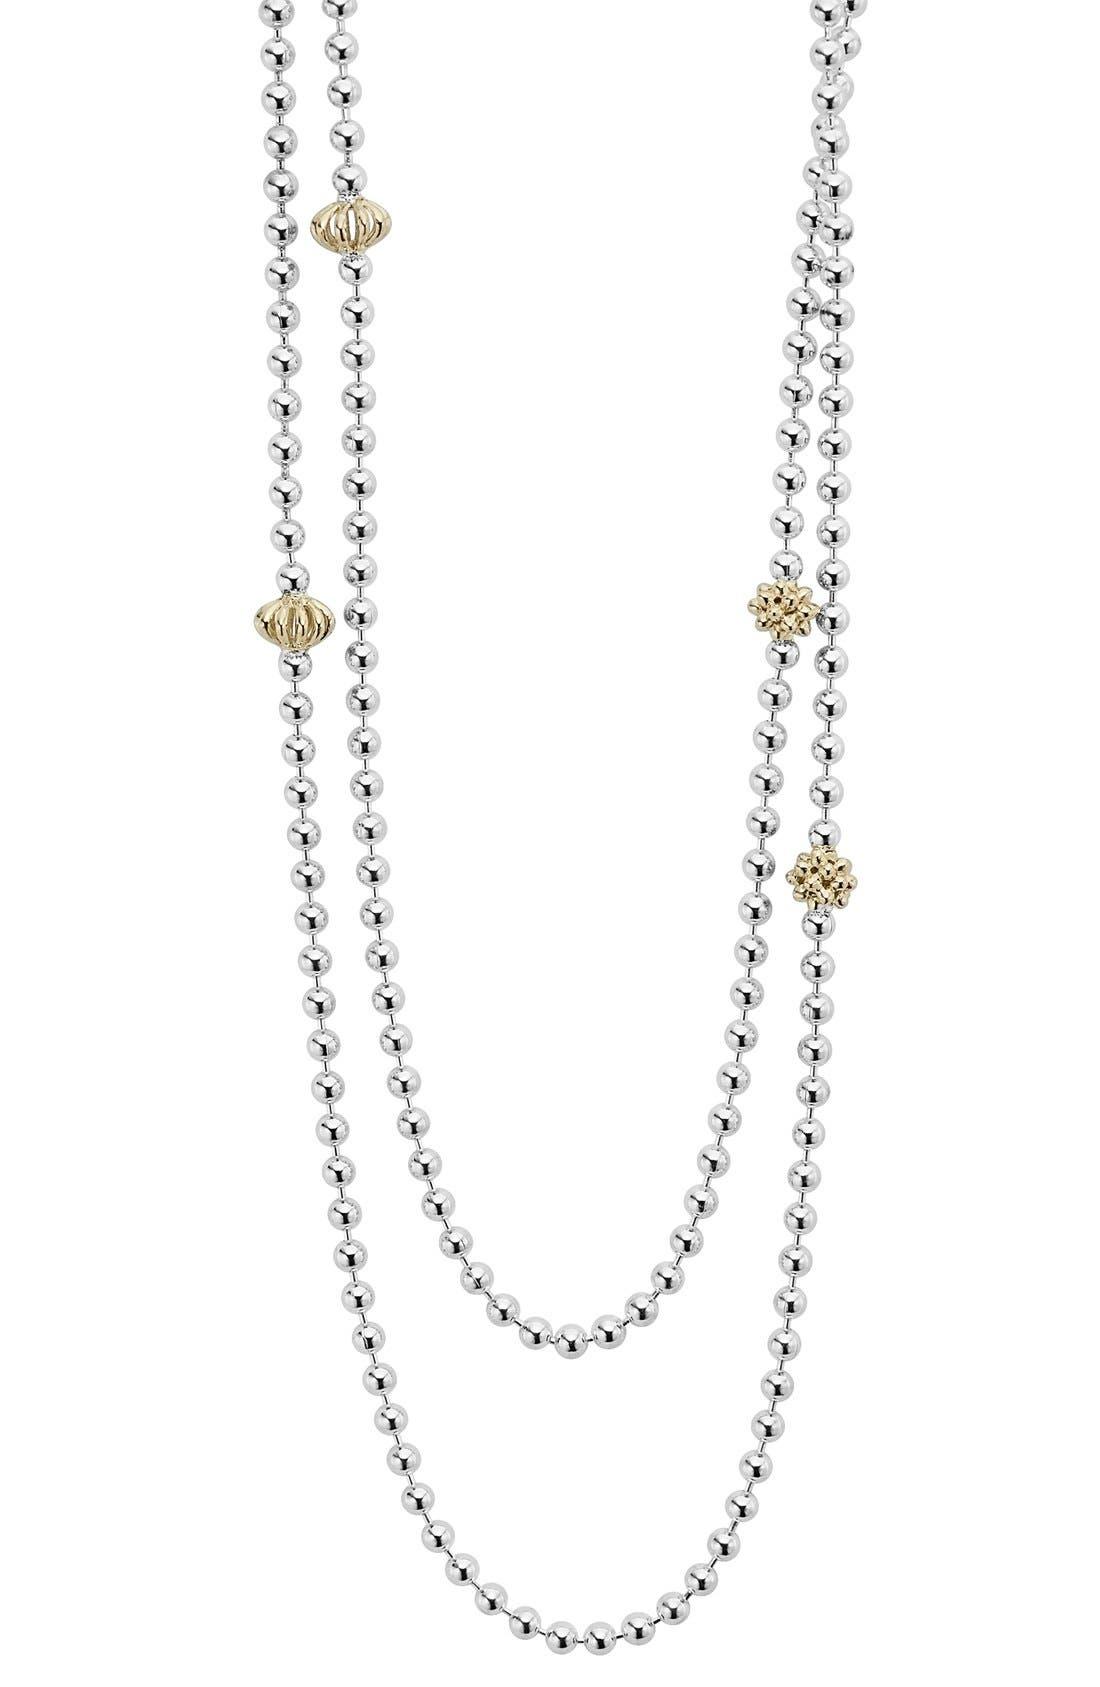 'Caviar Icon' Strand Necklace,                             Main thumbnail 1, color,                             SILVER/ GOLD